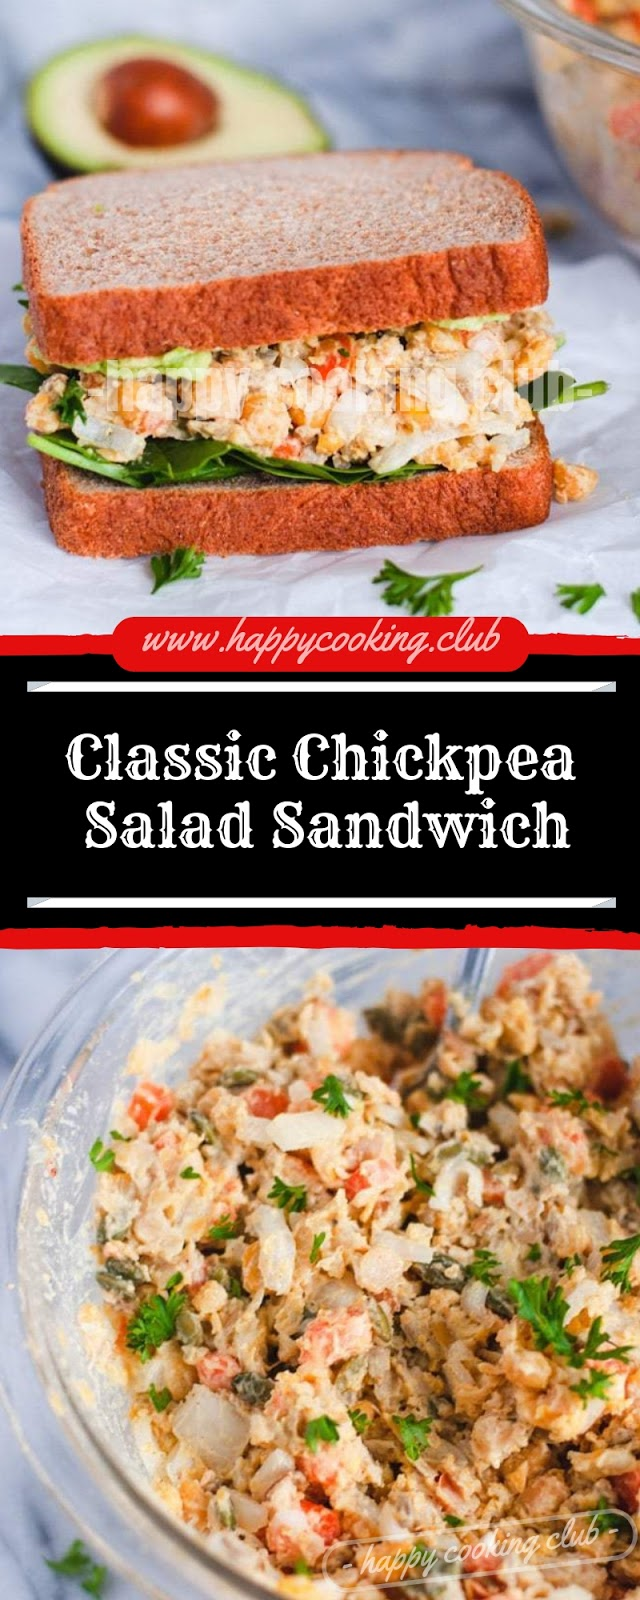 Classic Chickpea Salad Sandwich